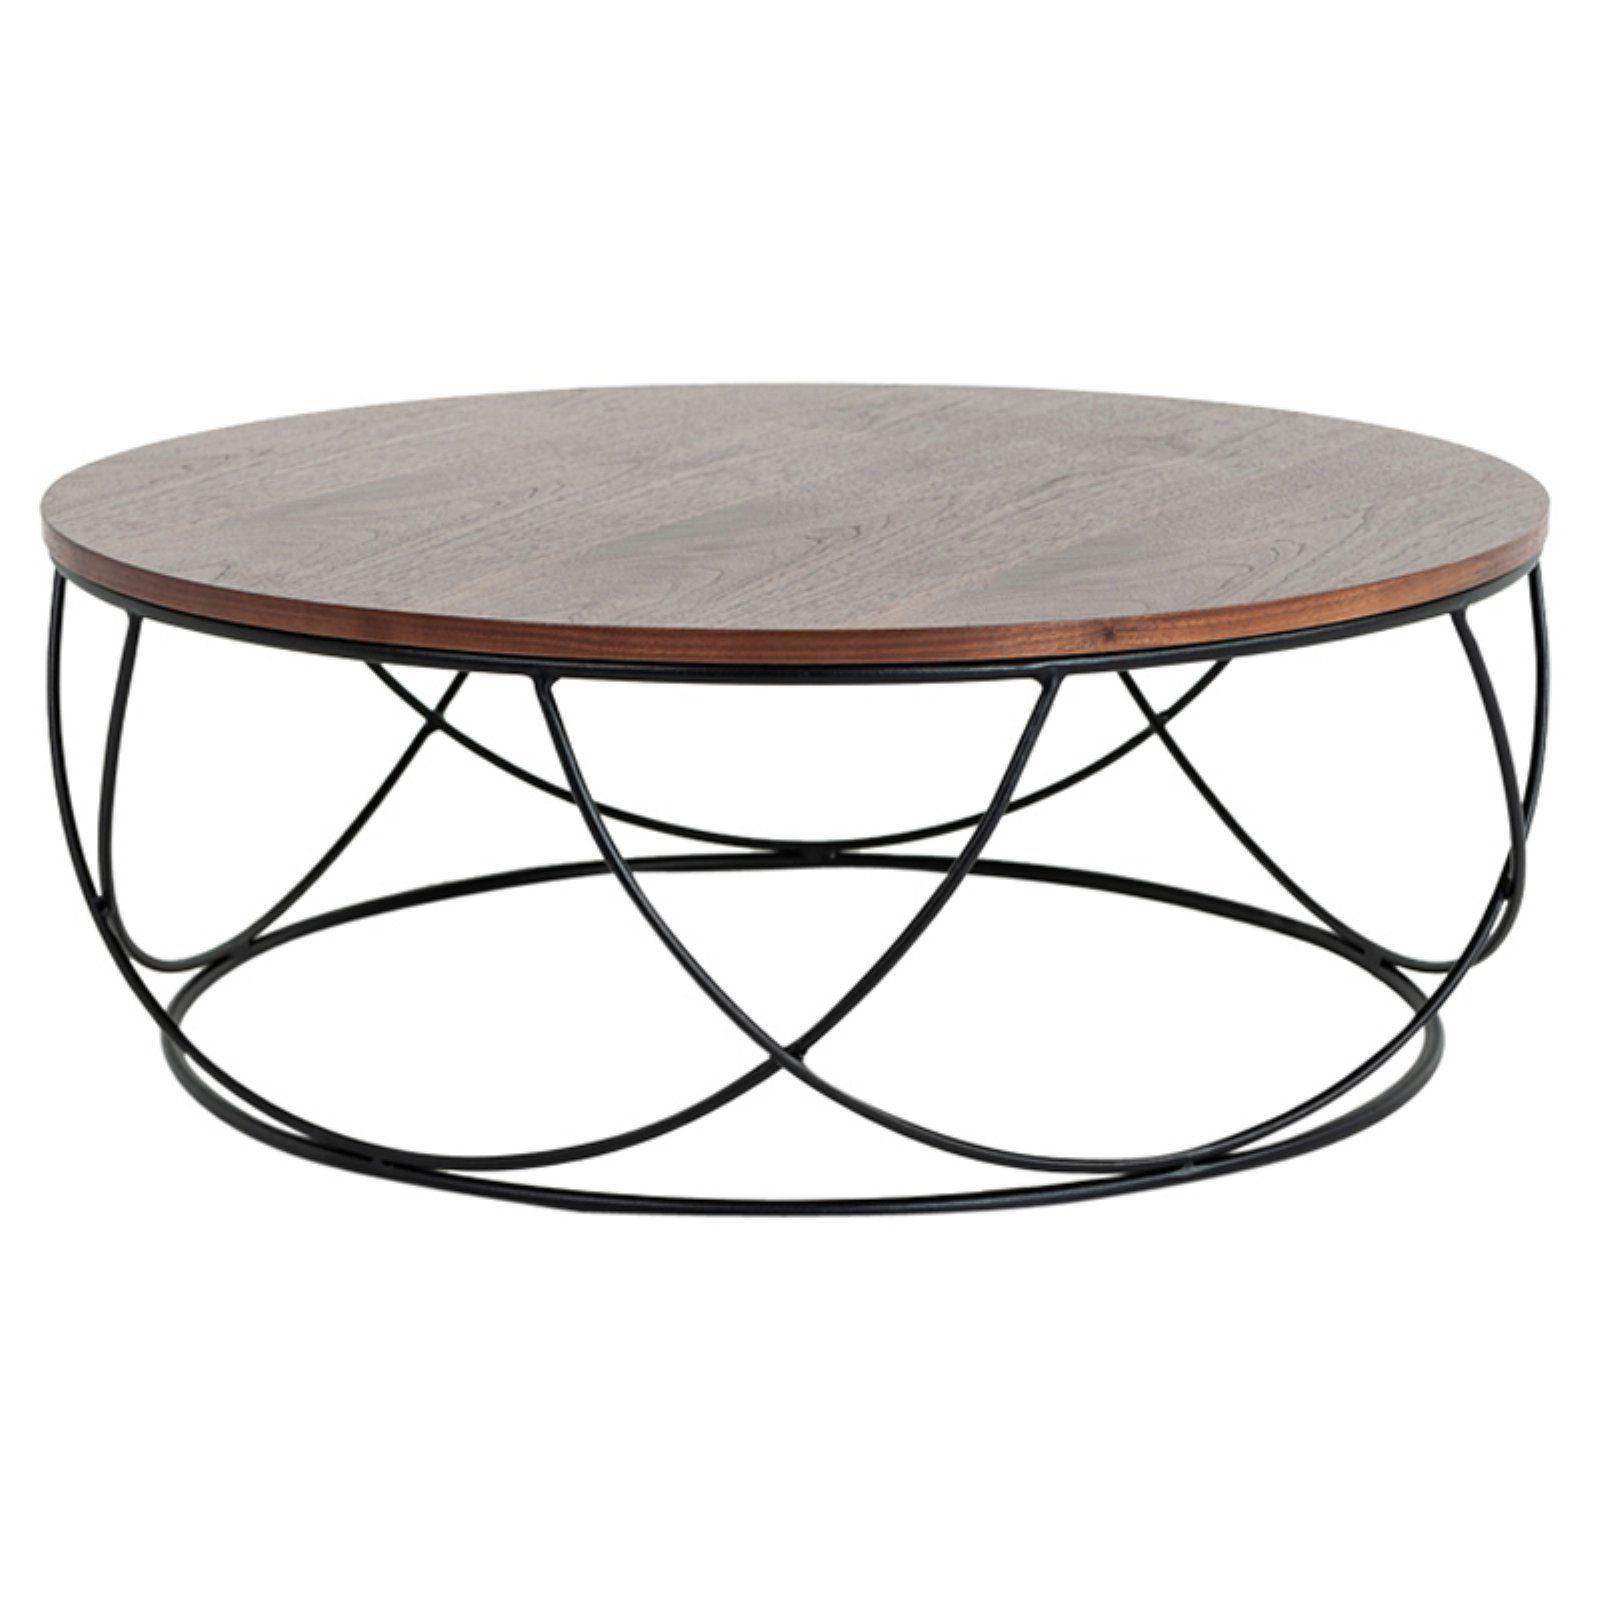 Vig Furniture Modrest Strang Modern Round Coffee Table Round Coffee Table Modern Coffee Table Wood Coffee Table Walmart [ 1600 x 1600 Pixel ]